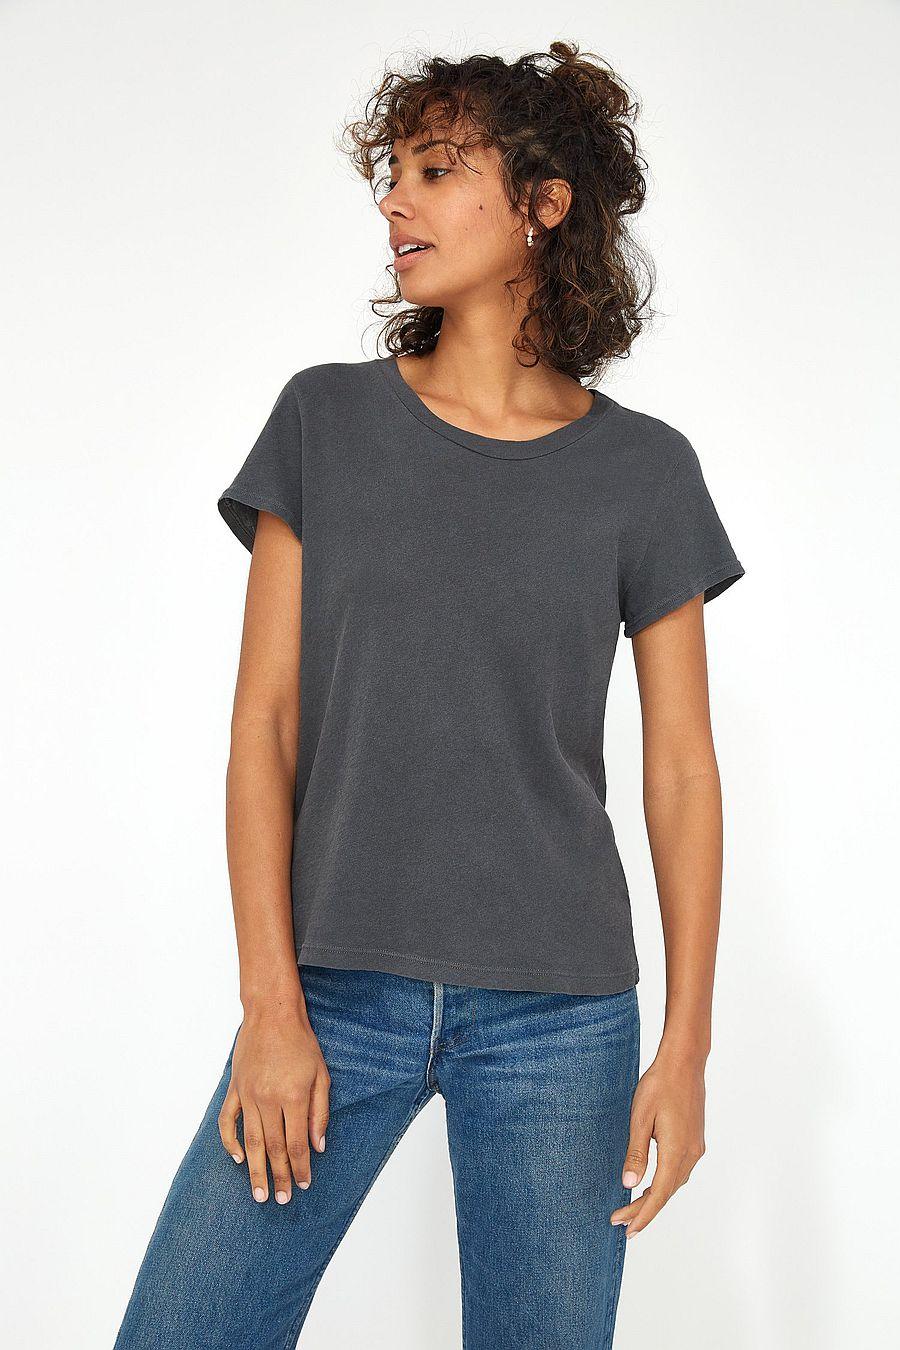 LACAUSA Clothing Frank Tee - Slate